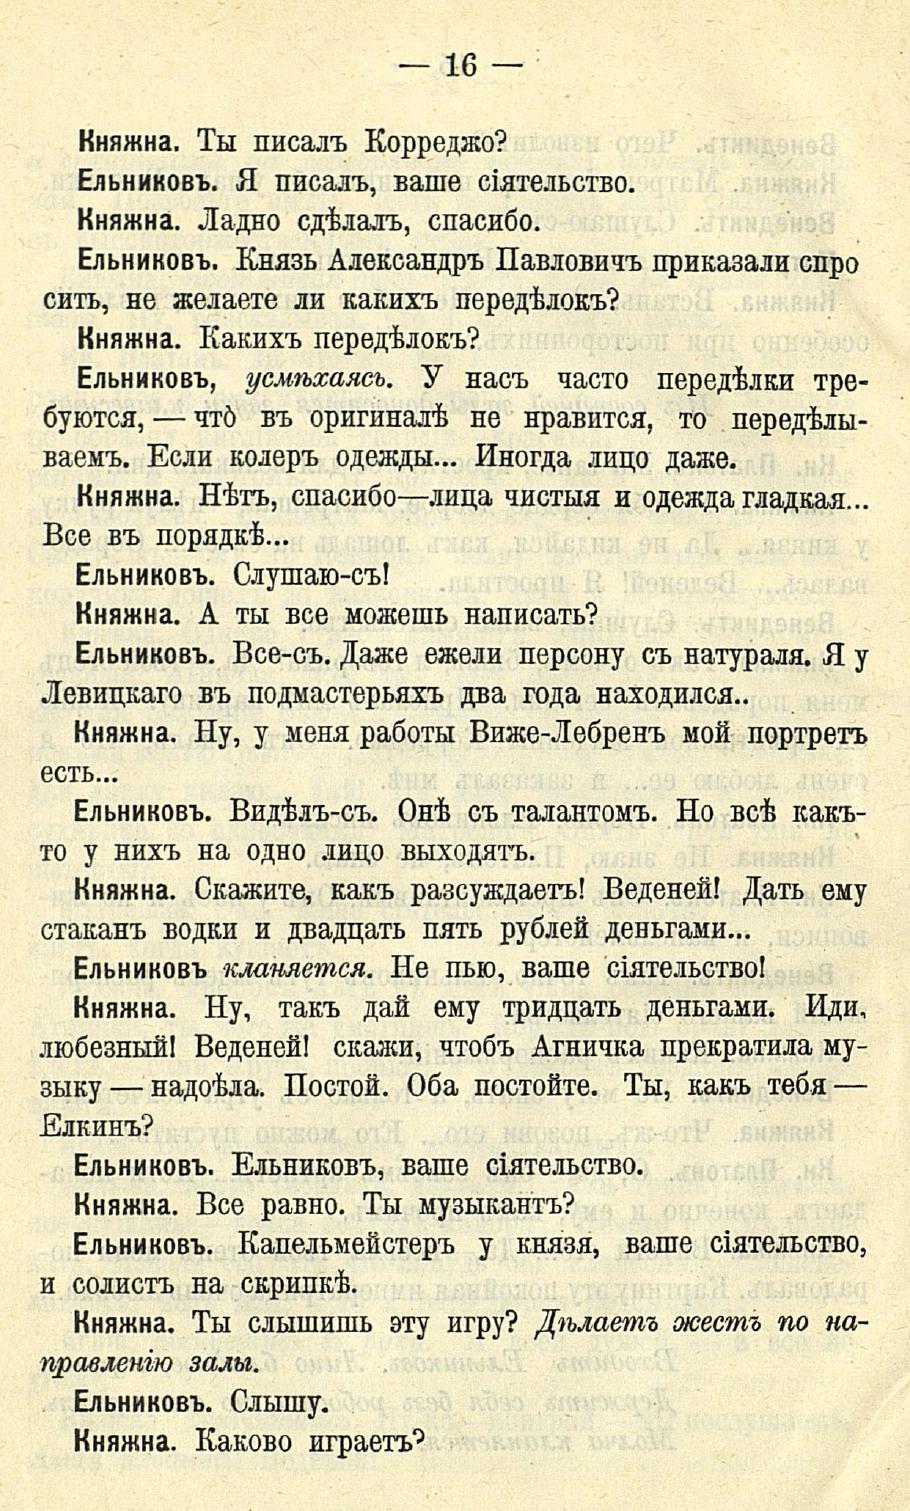 http://images.vfl.ru/ii/1405712486/85459ab9/5744763.jpg